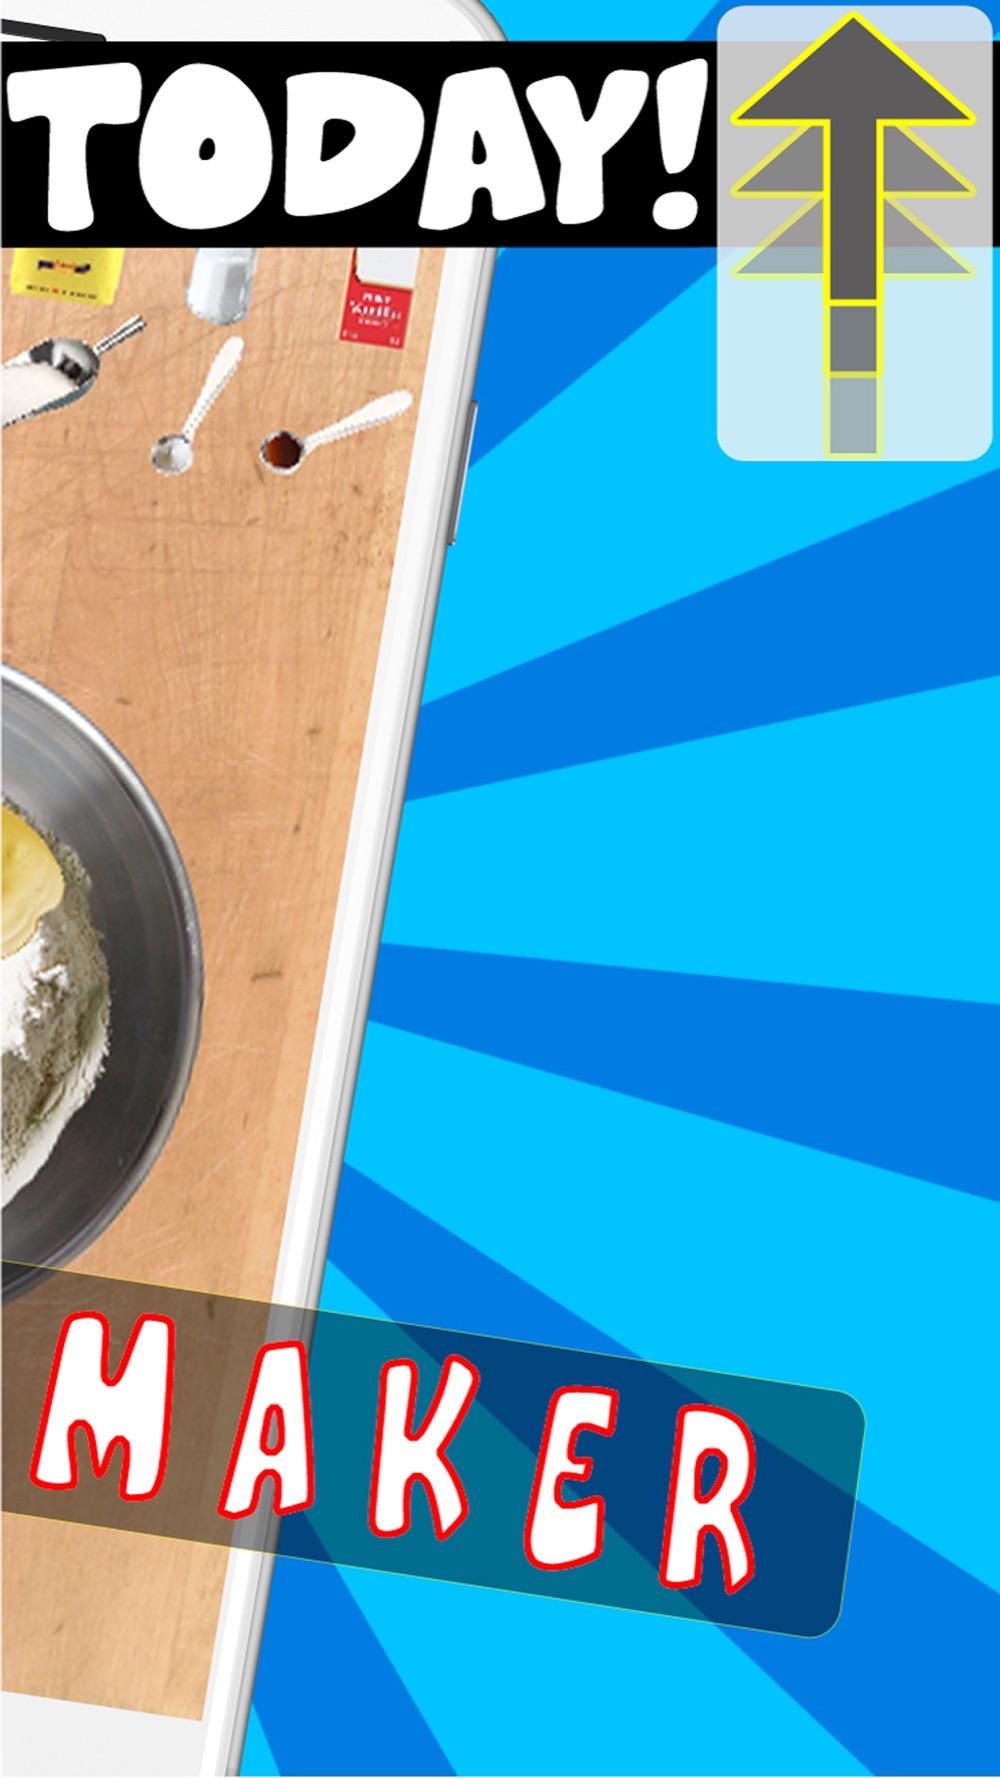 Cookie Maker Cake Games - Free Dessert Food Cooking Game for Kids hack tool